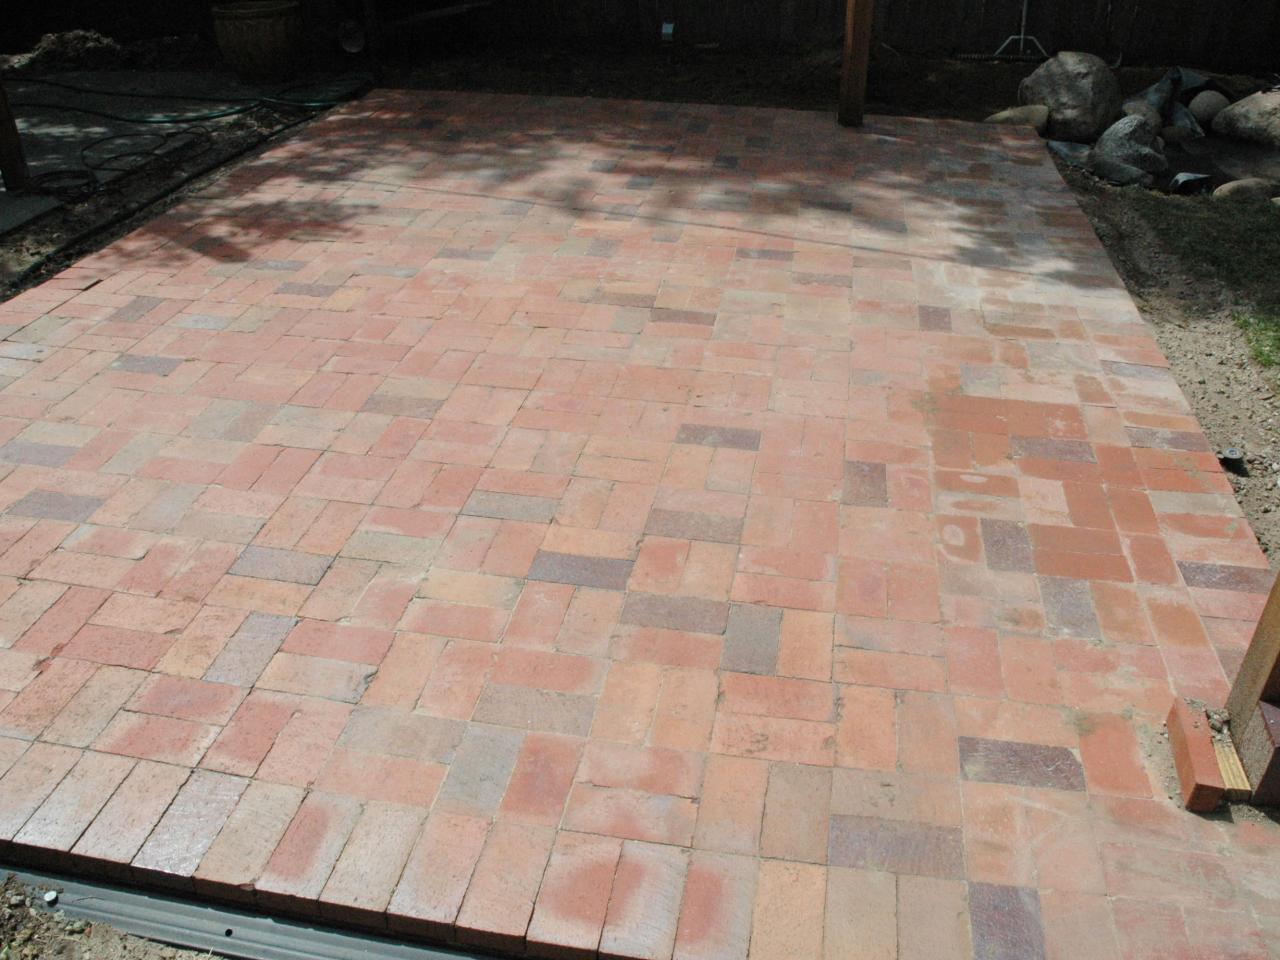 brick patio step 5 TKBNDYH